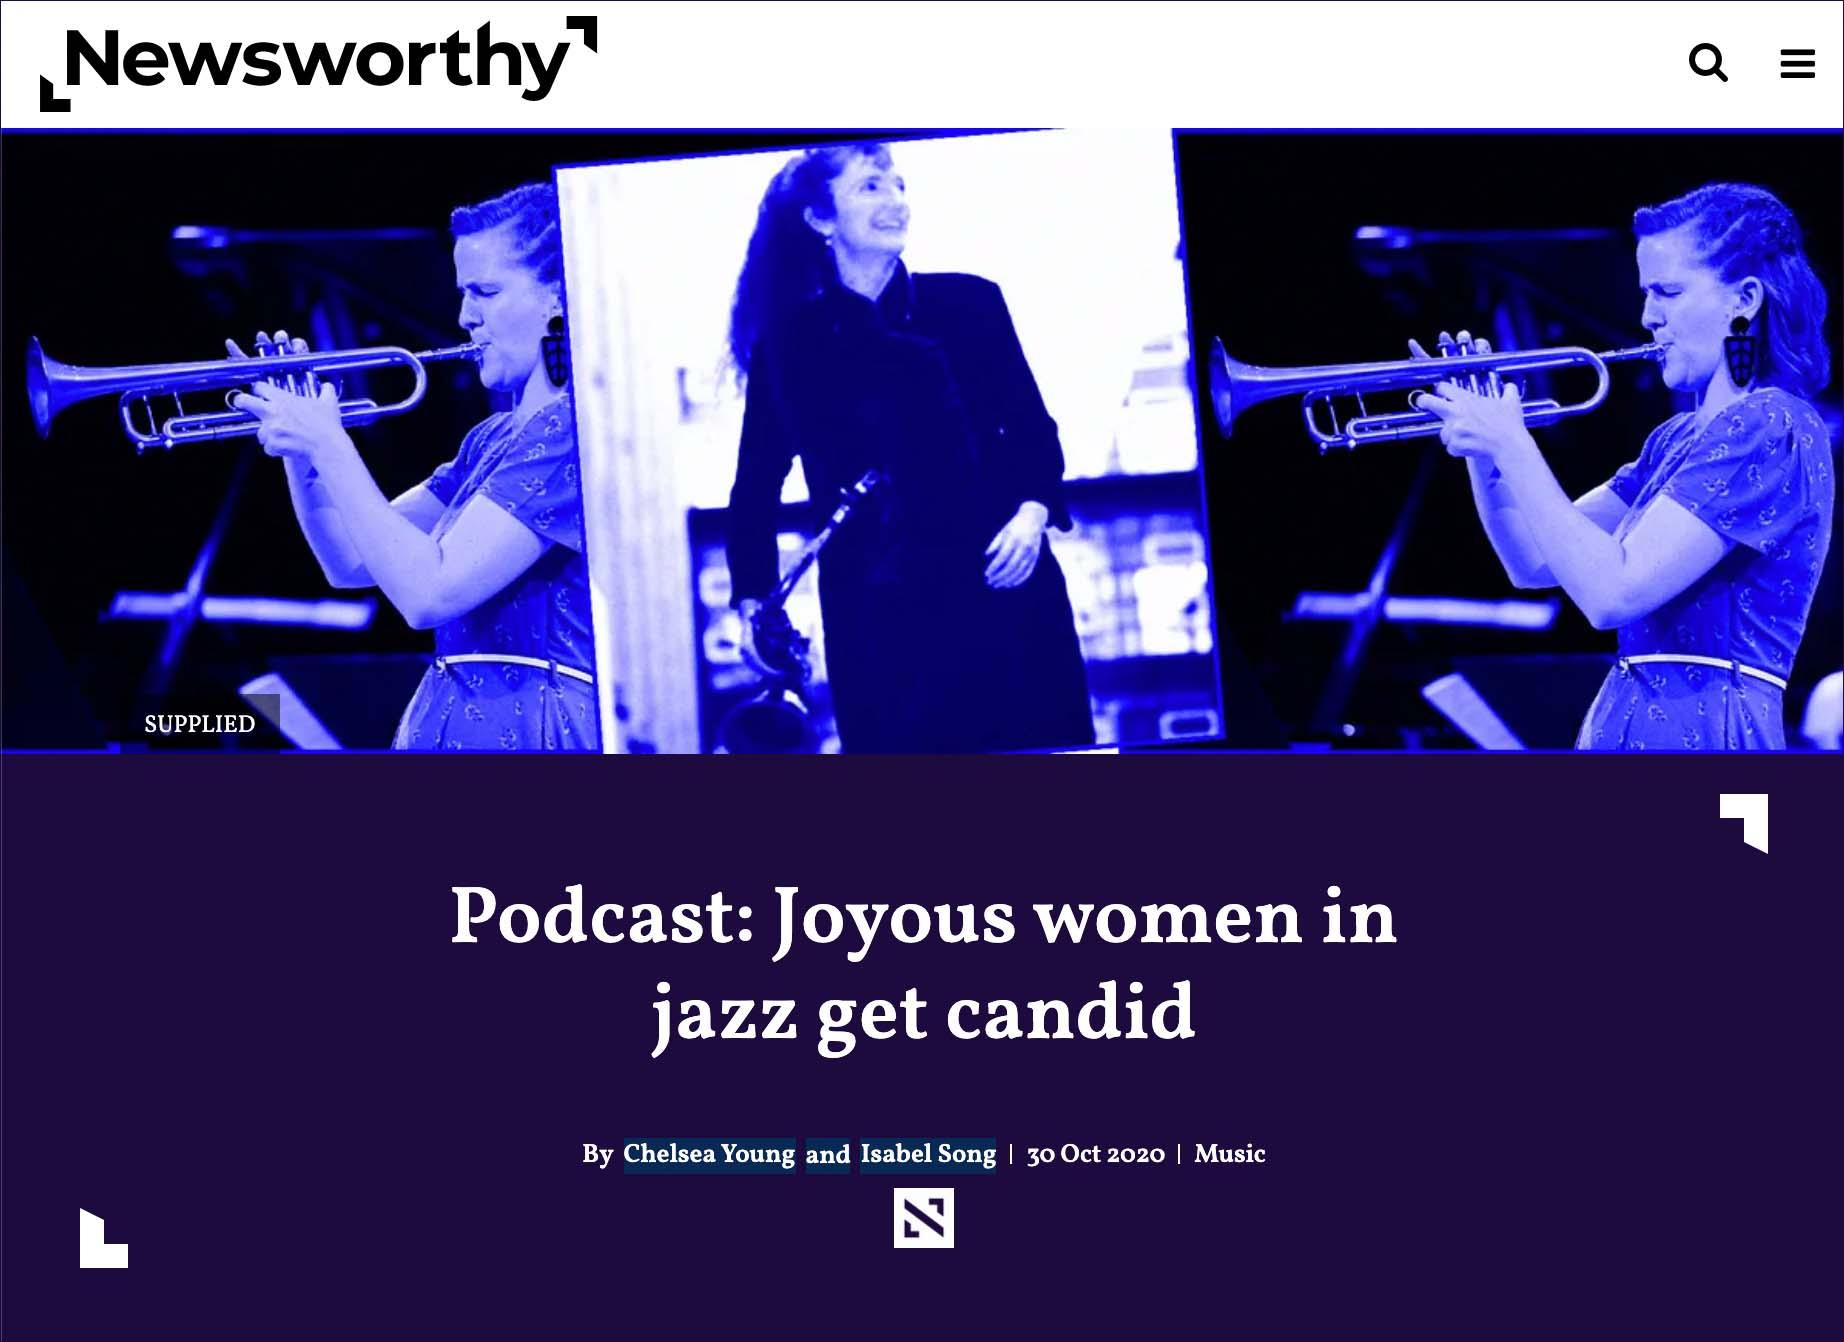 Podcast: Joyous women in jazz get candid